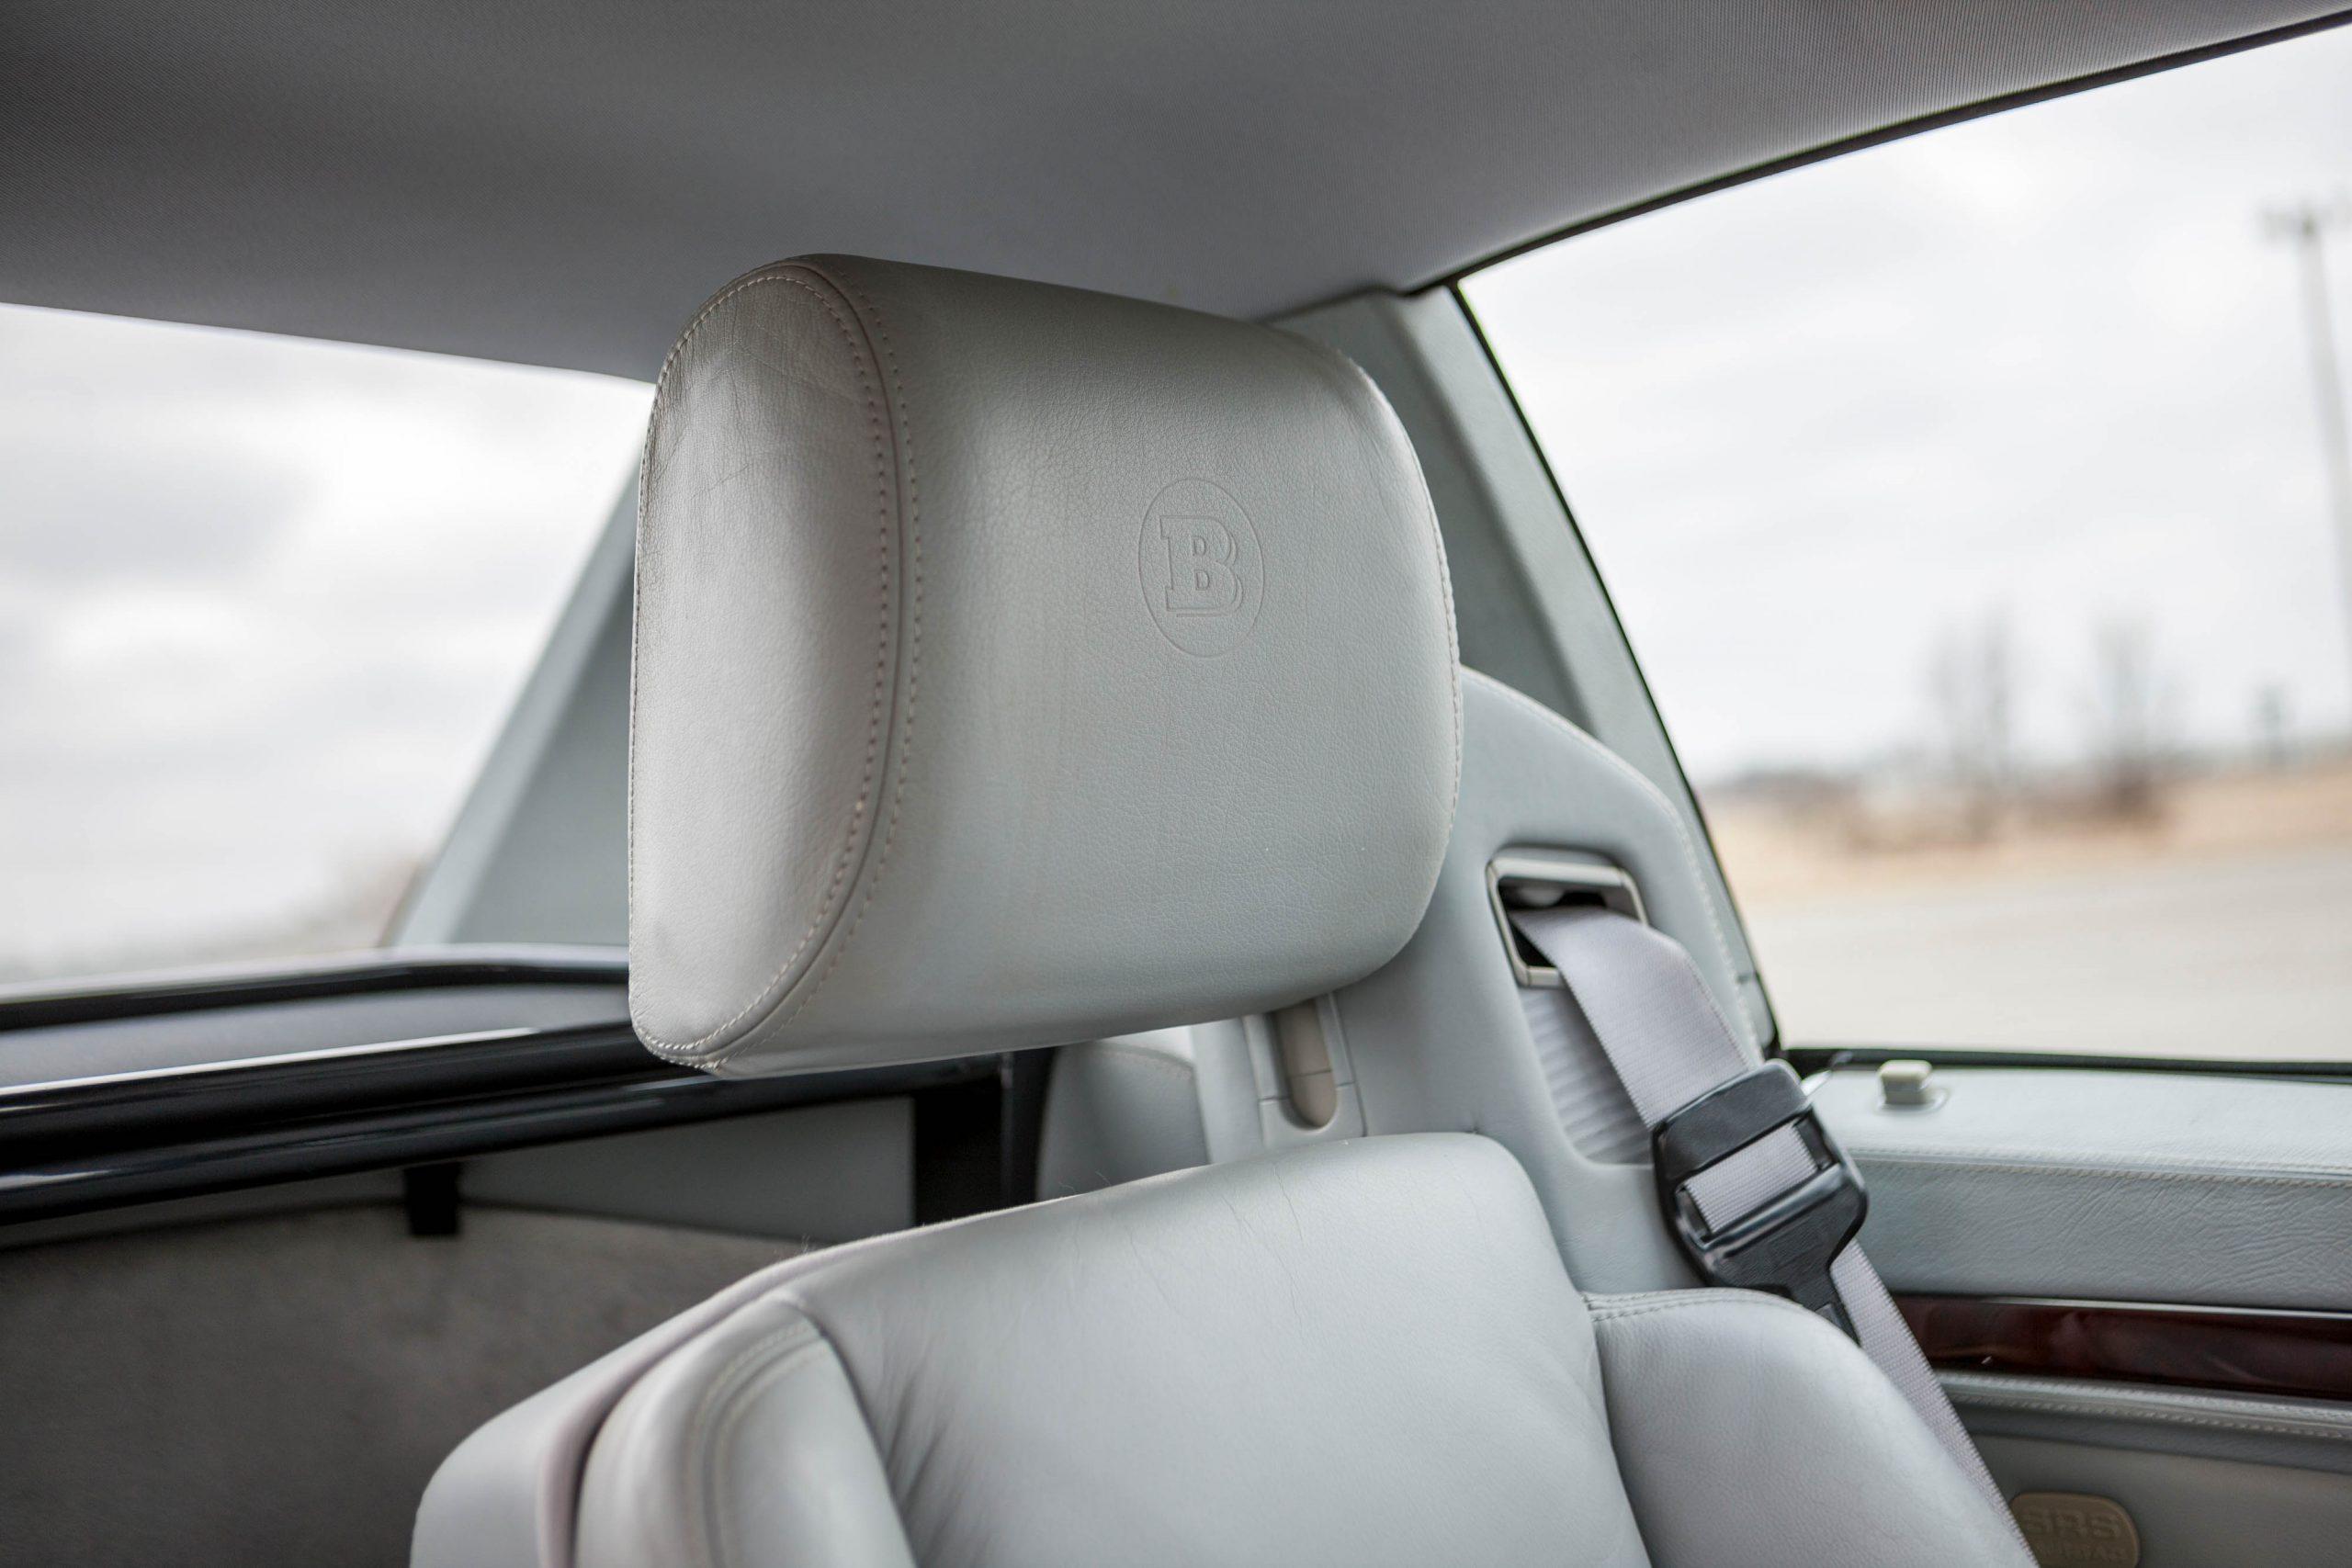 1999 Mercedes-Benz Brabus 7.3 S headrest